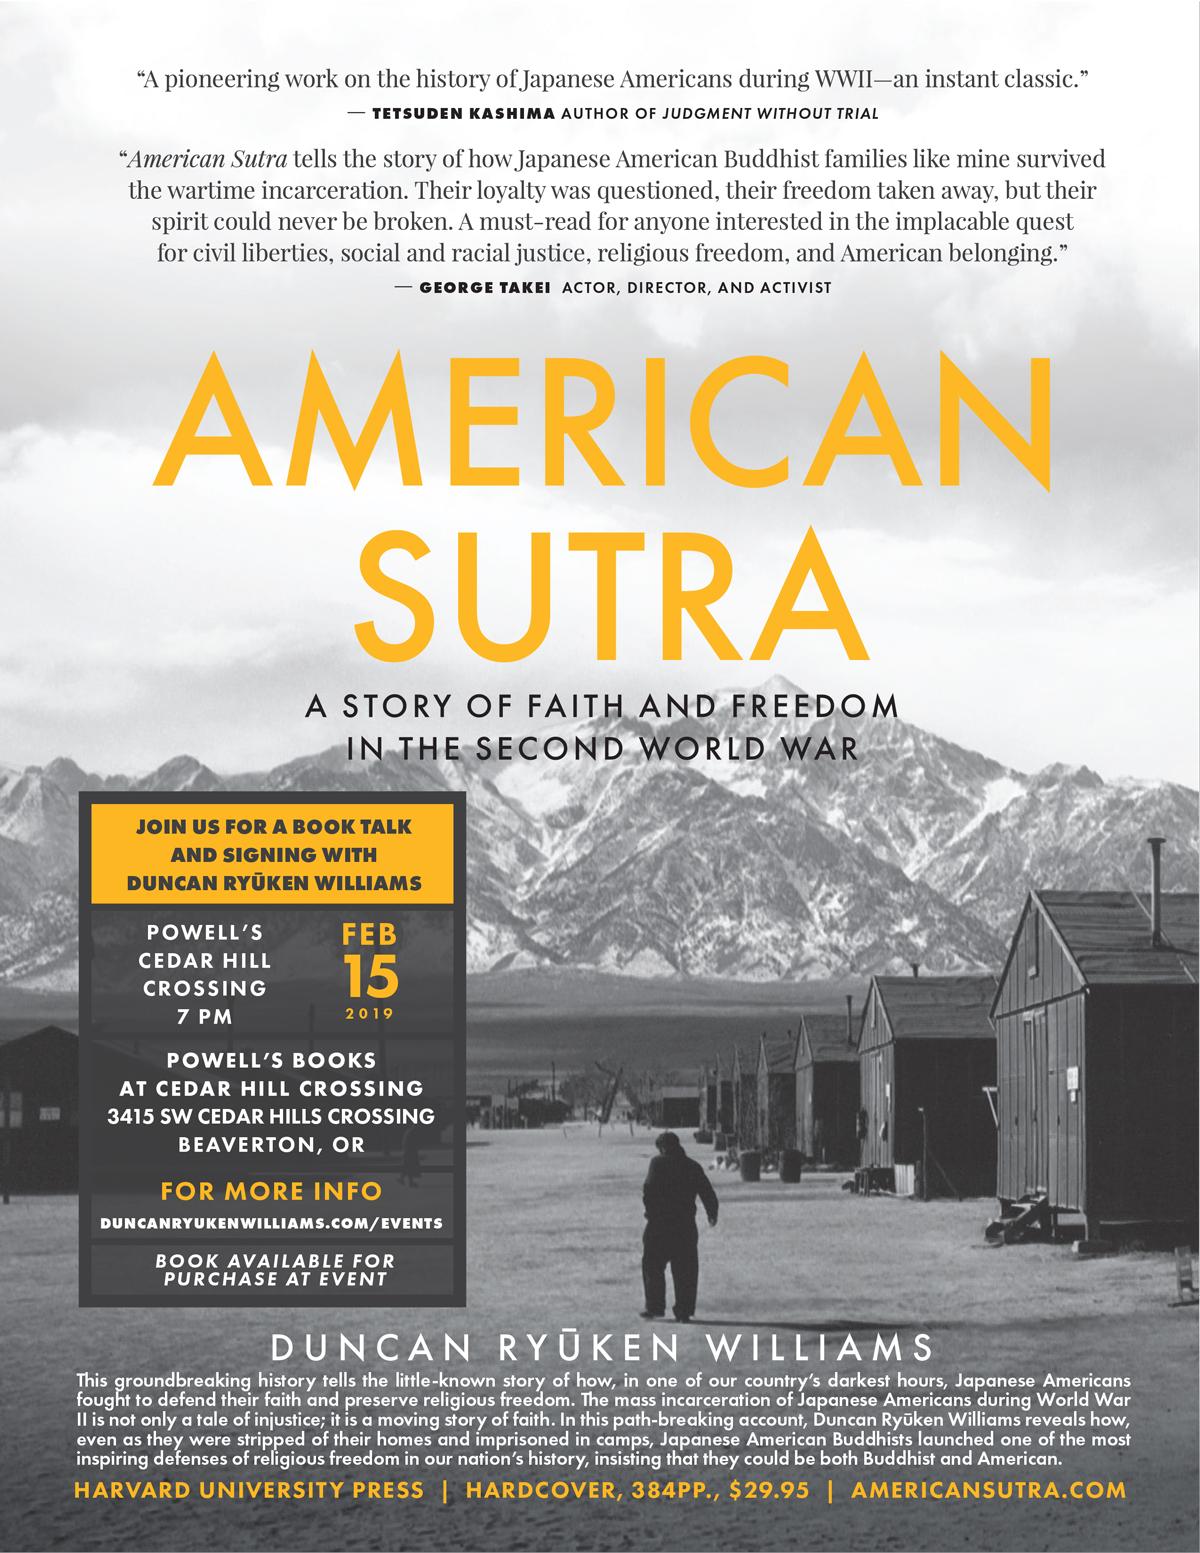 AmericanSutra-Flyer-V1-121418-Portland.jpg